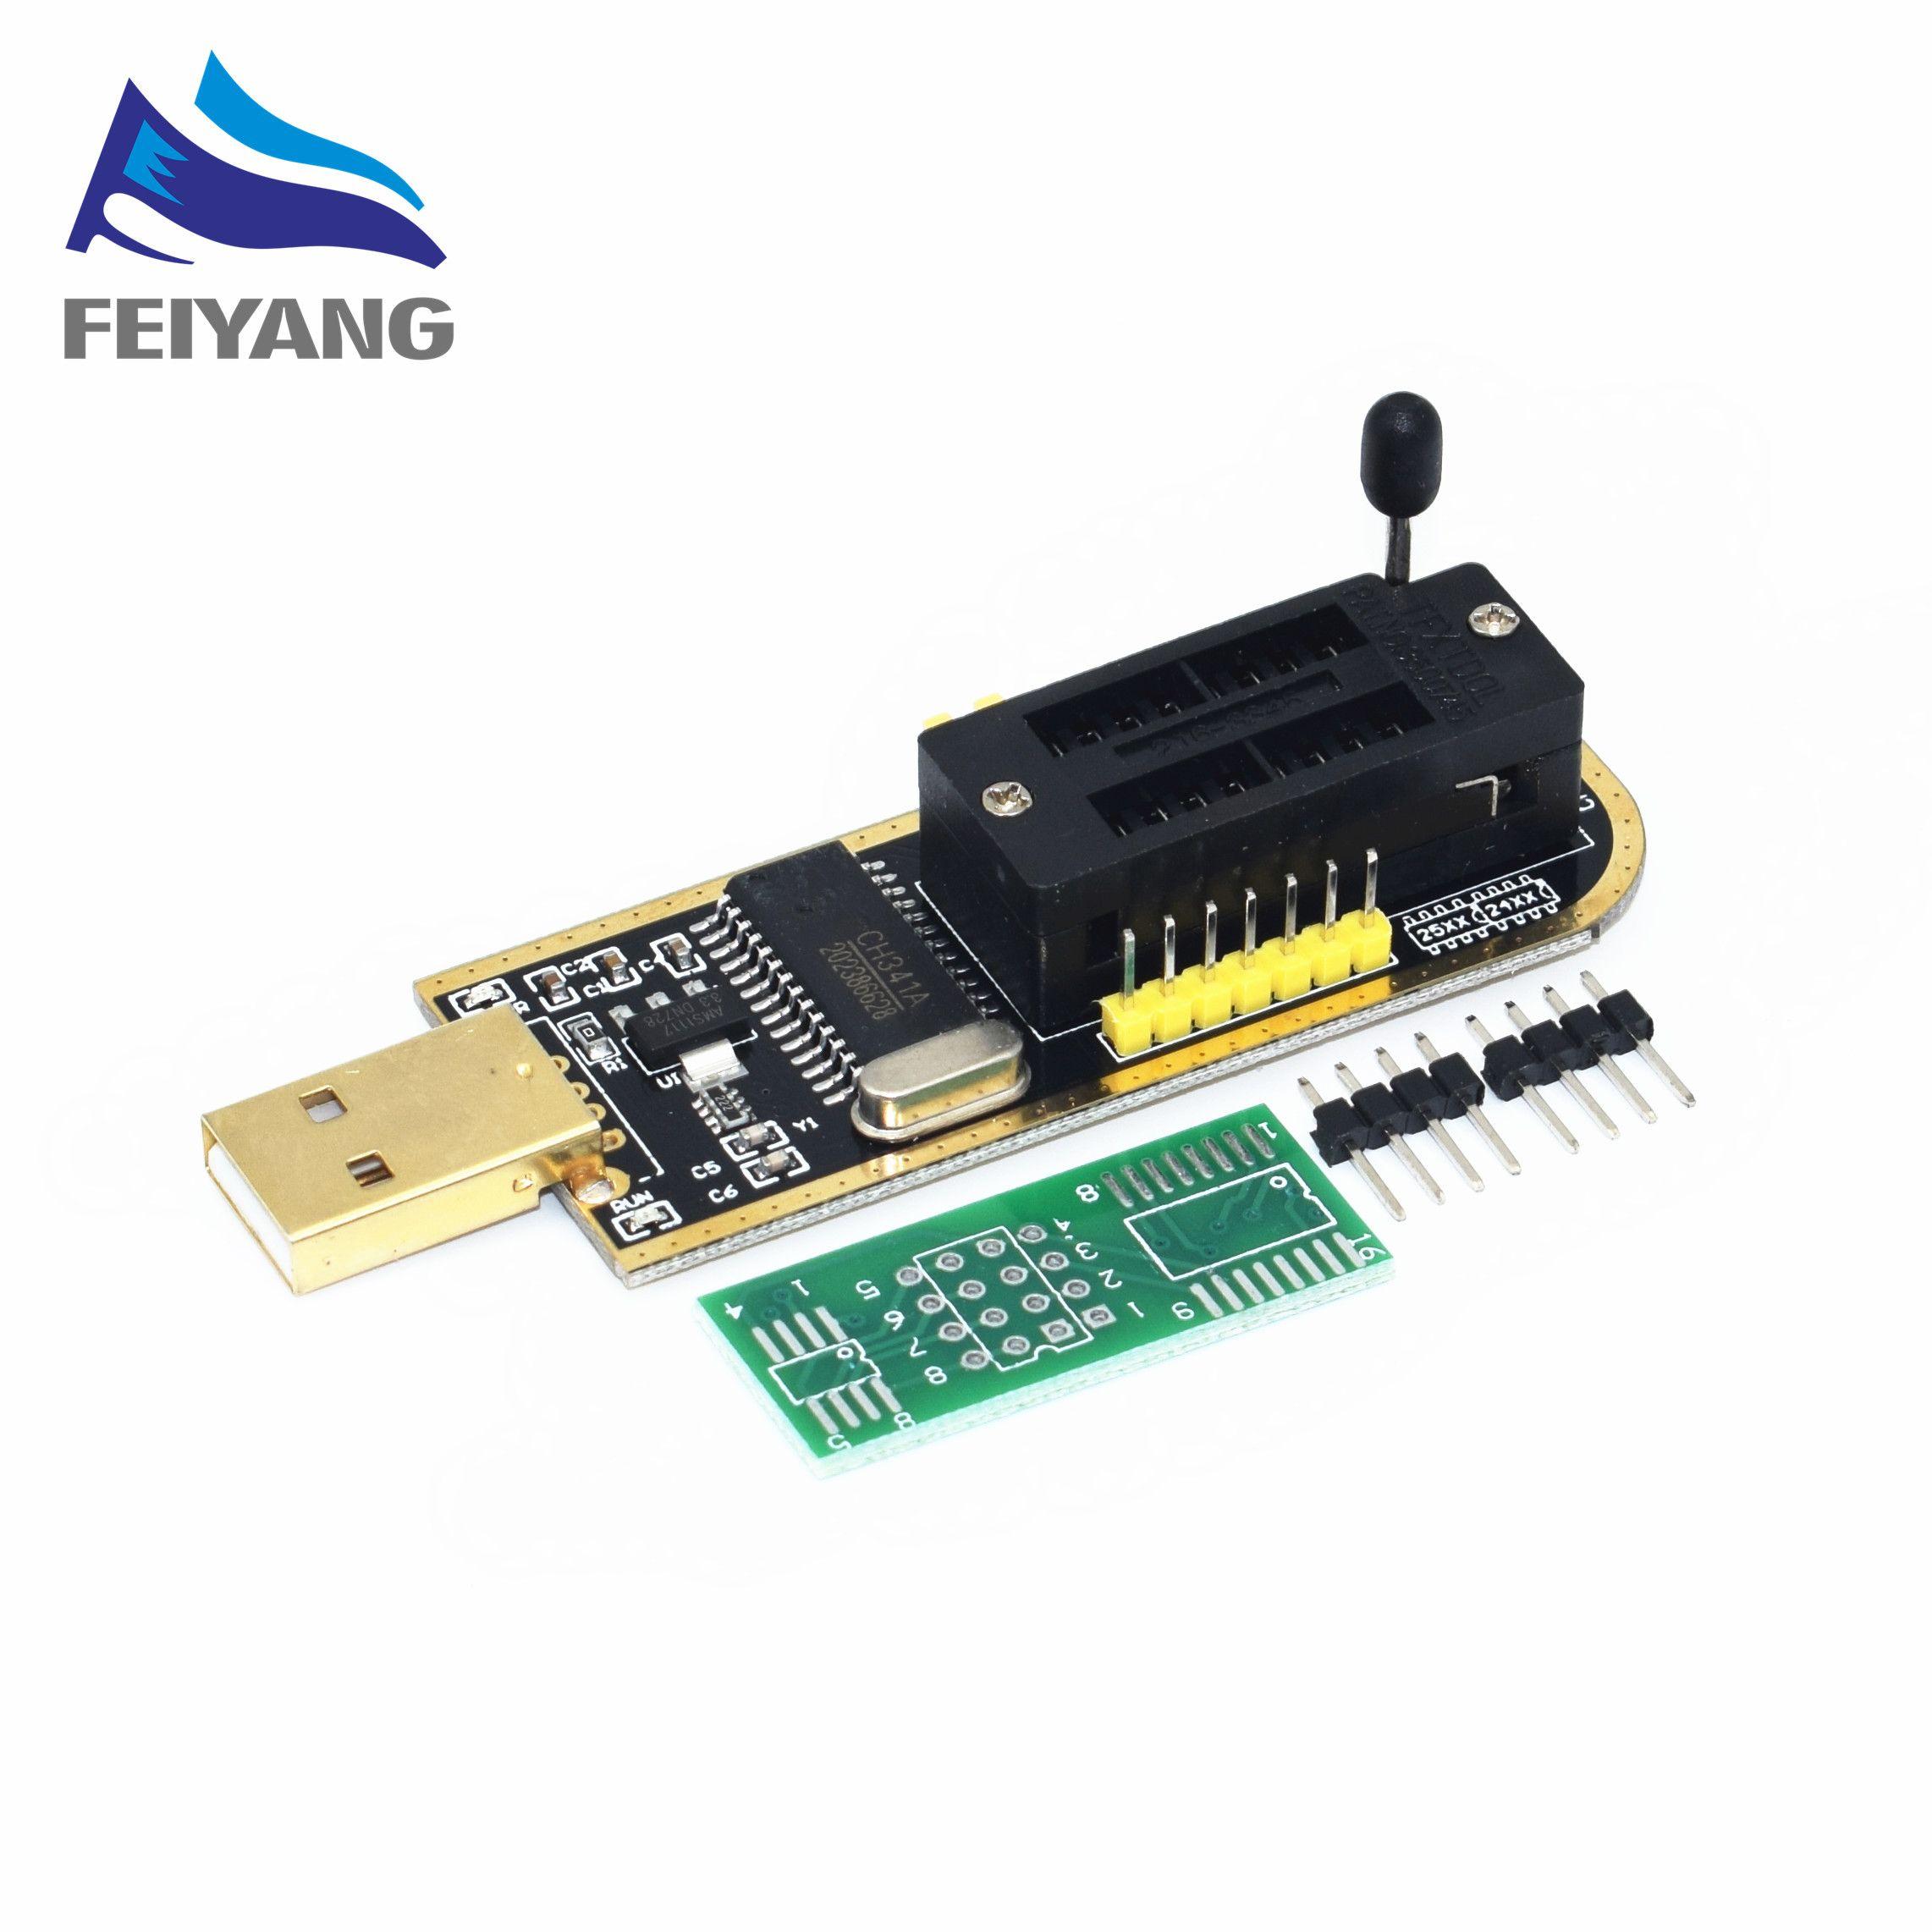 10 stücke Smart Elektronik CH340 CH340G CH341 CH341A 24 25 Serie EEPROM-Flash-BIOS-USB Programmierer mit Software & Fahrer